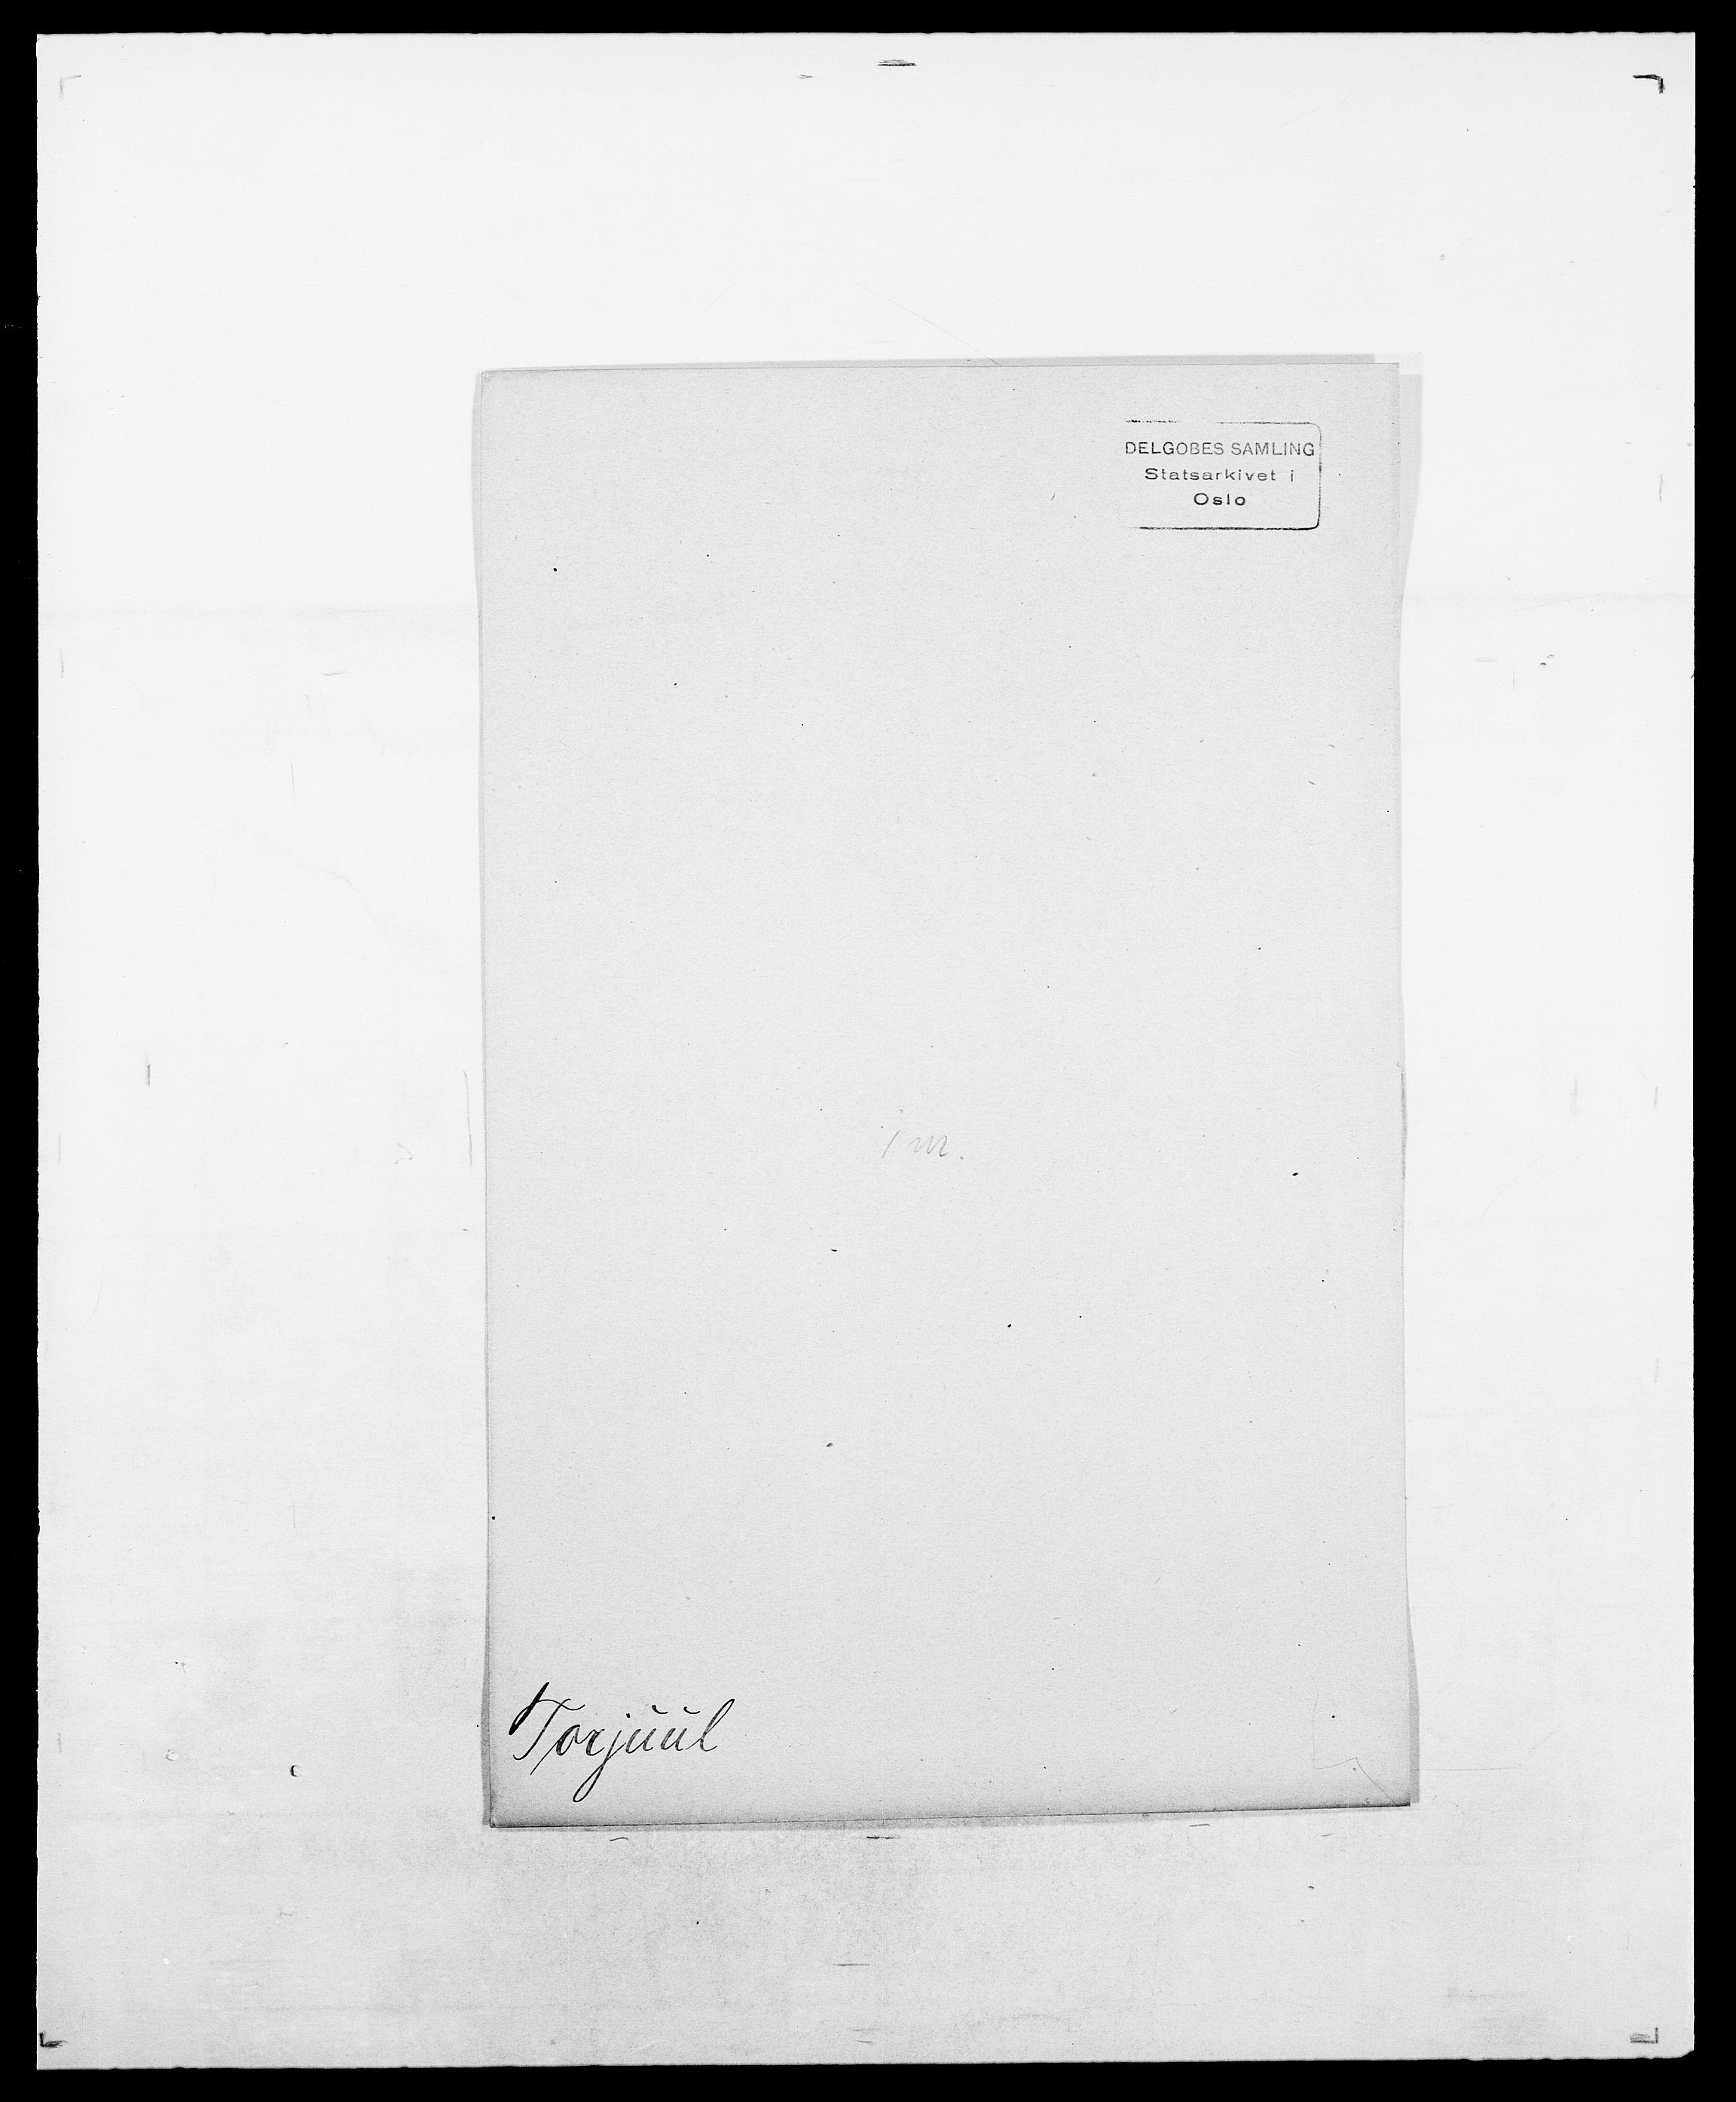 SAO, Delgobe, Charles Antoine - samling, D/Da/L0039: Thorsen - Urup, s. 174